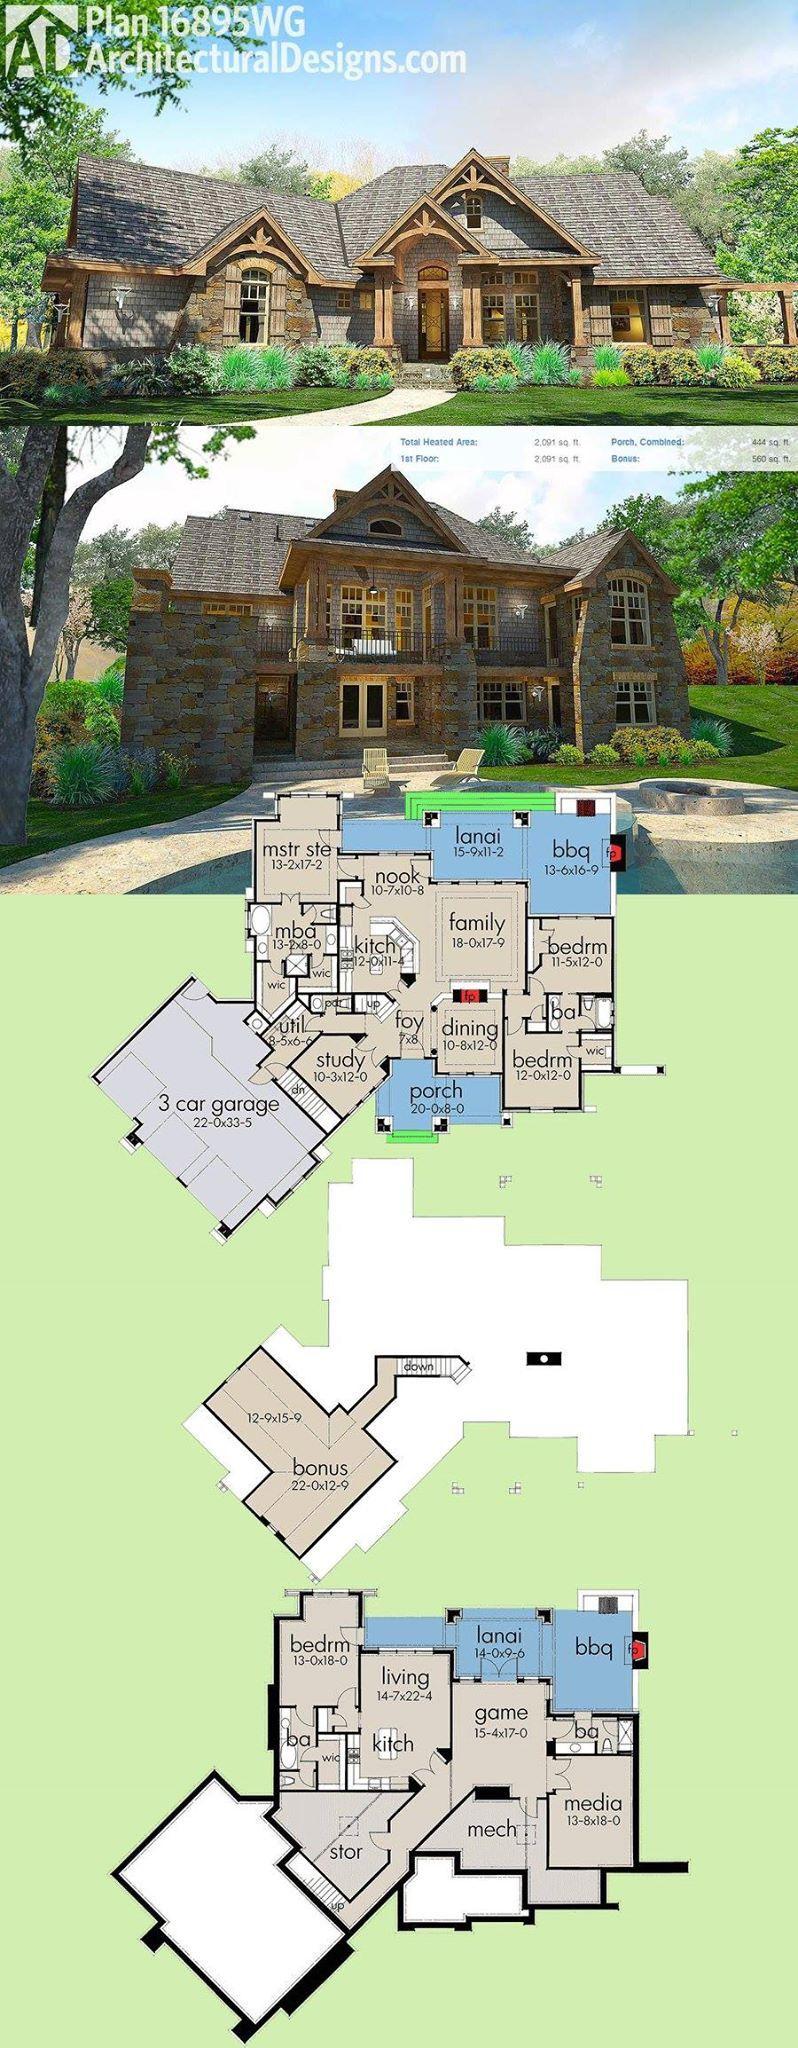 plan 16895wg stunning craftsman with 3 car garage and expansion up